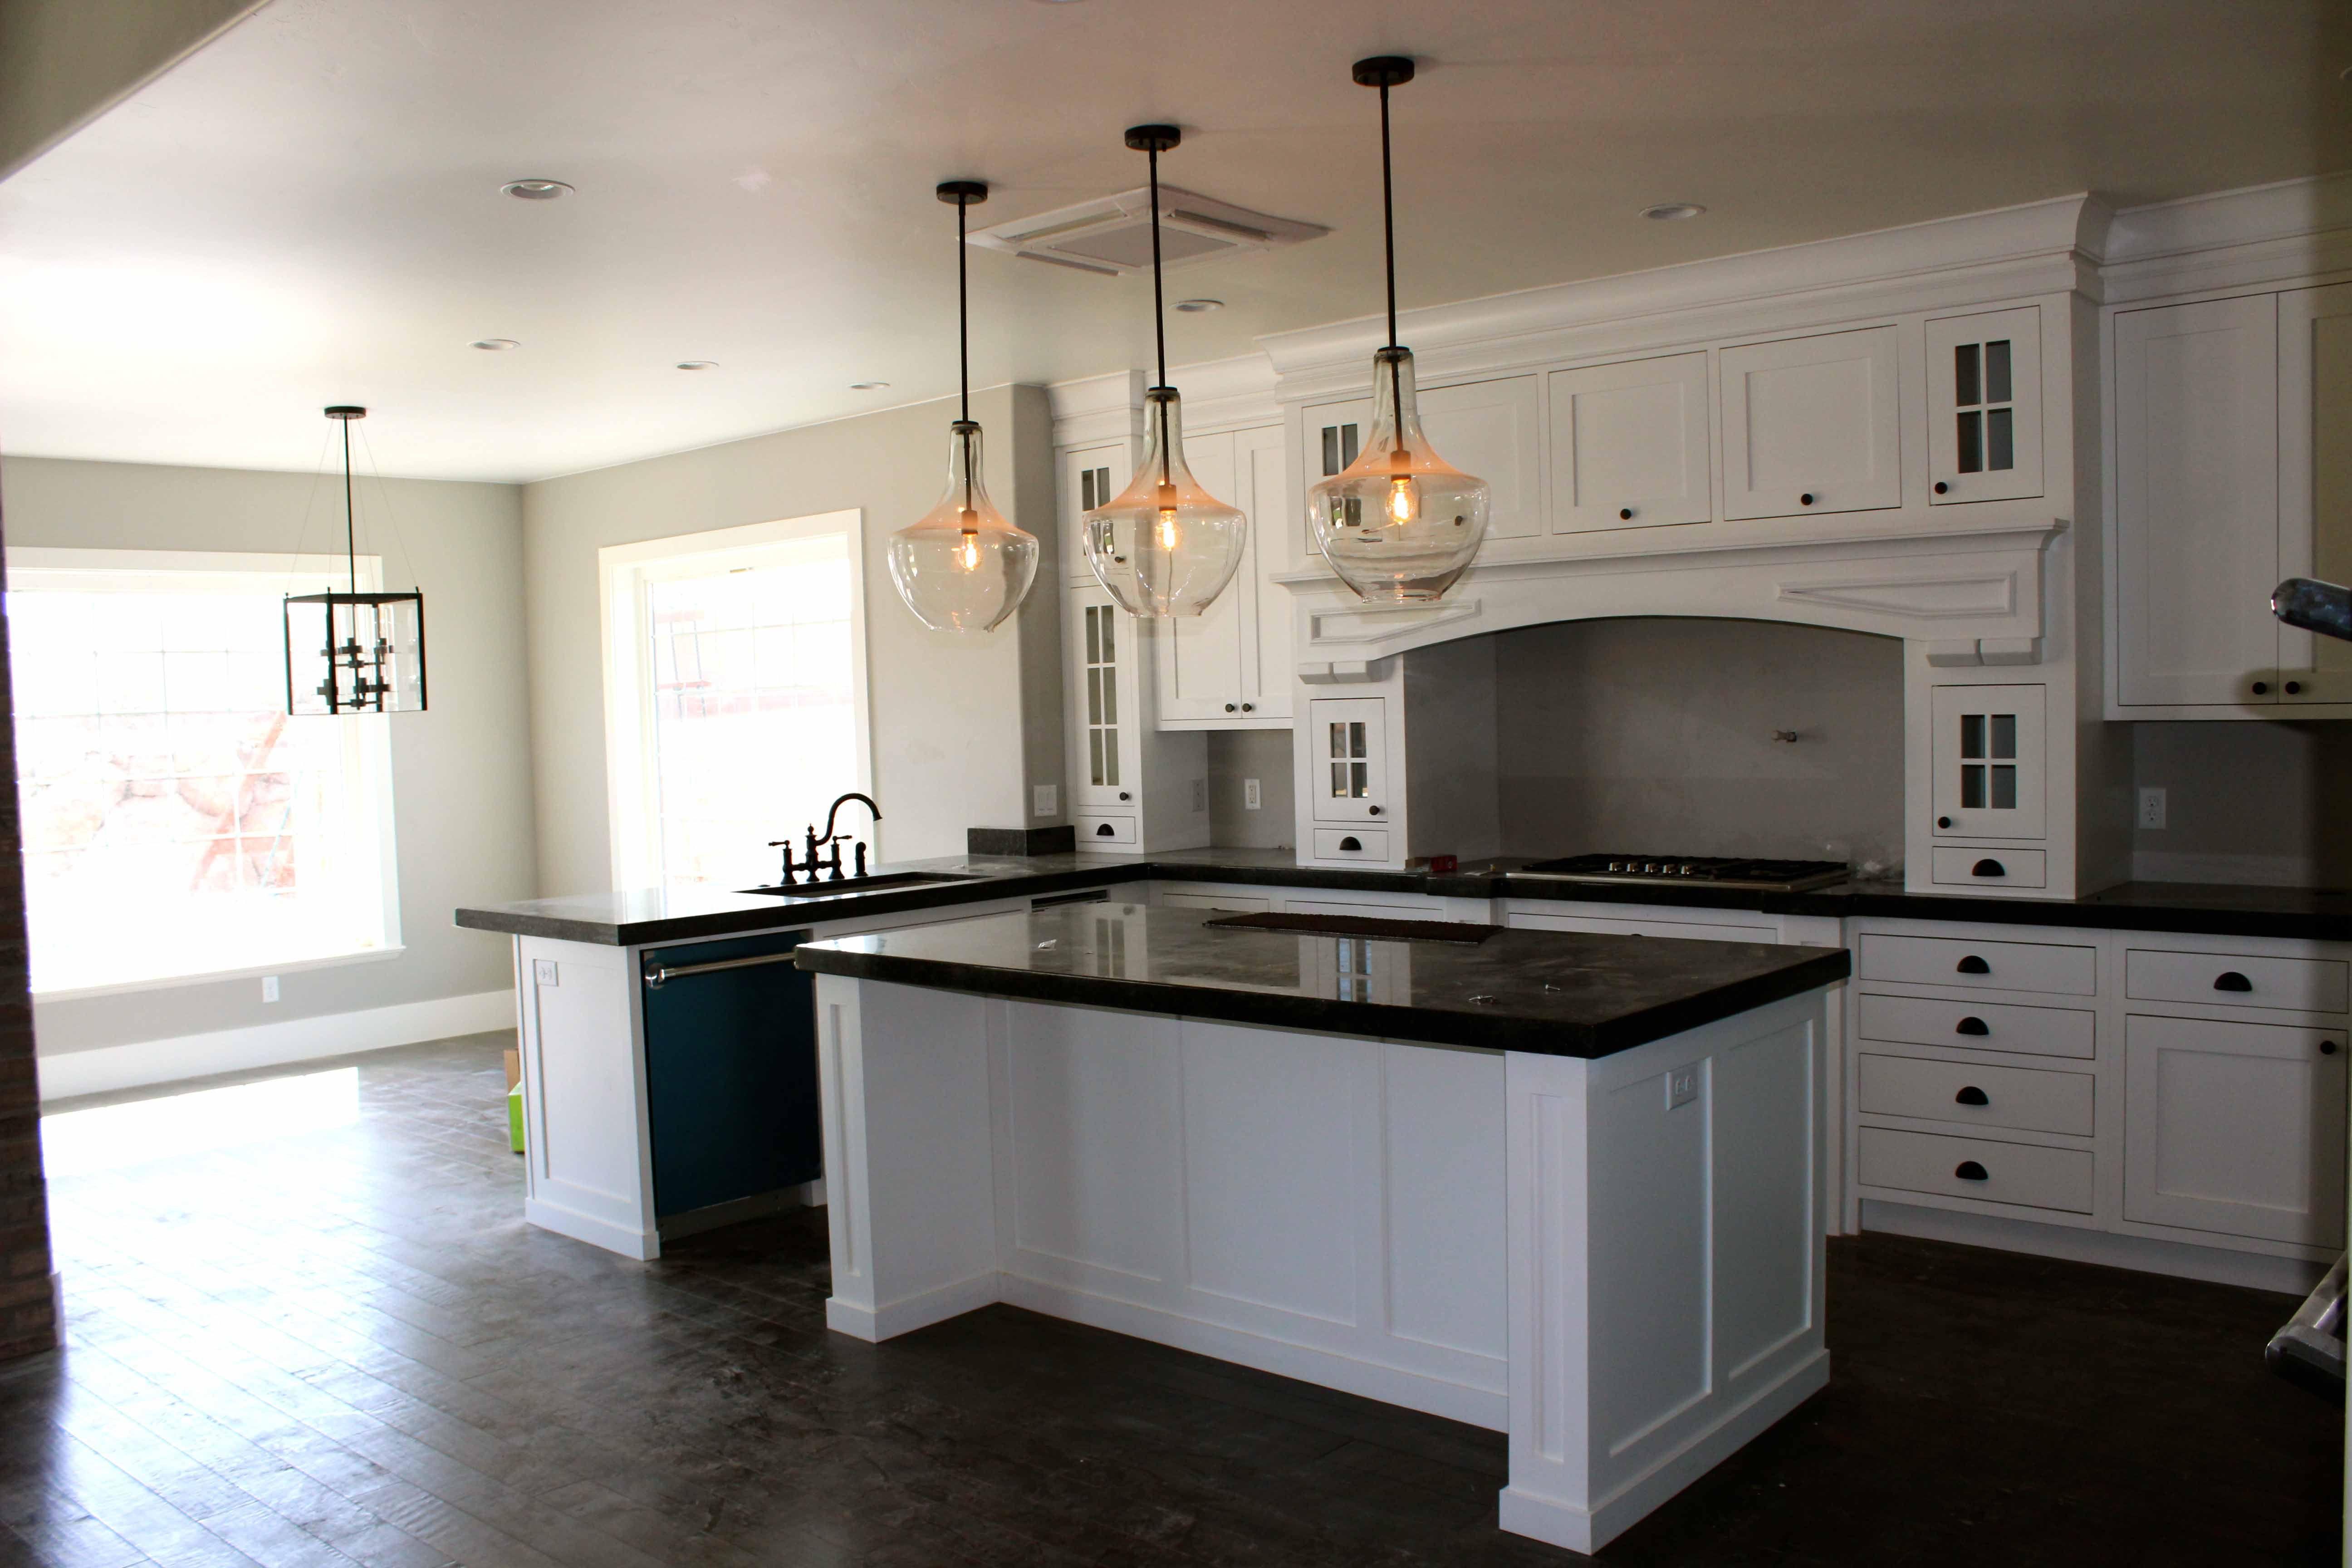 Pendant light fixtures over island 13 inspiring kitchen lighting